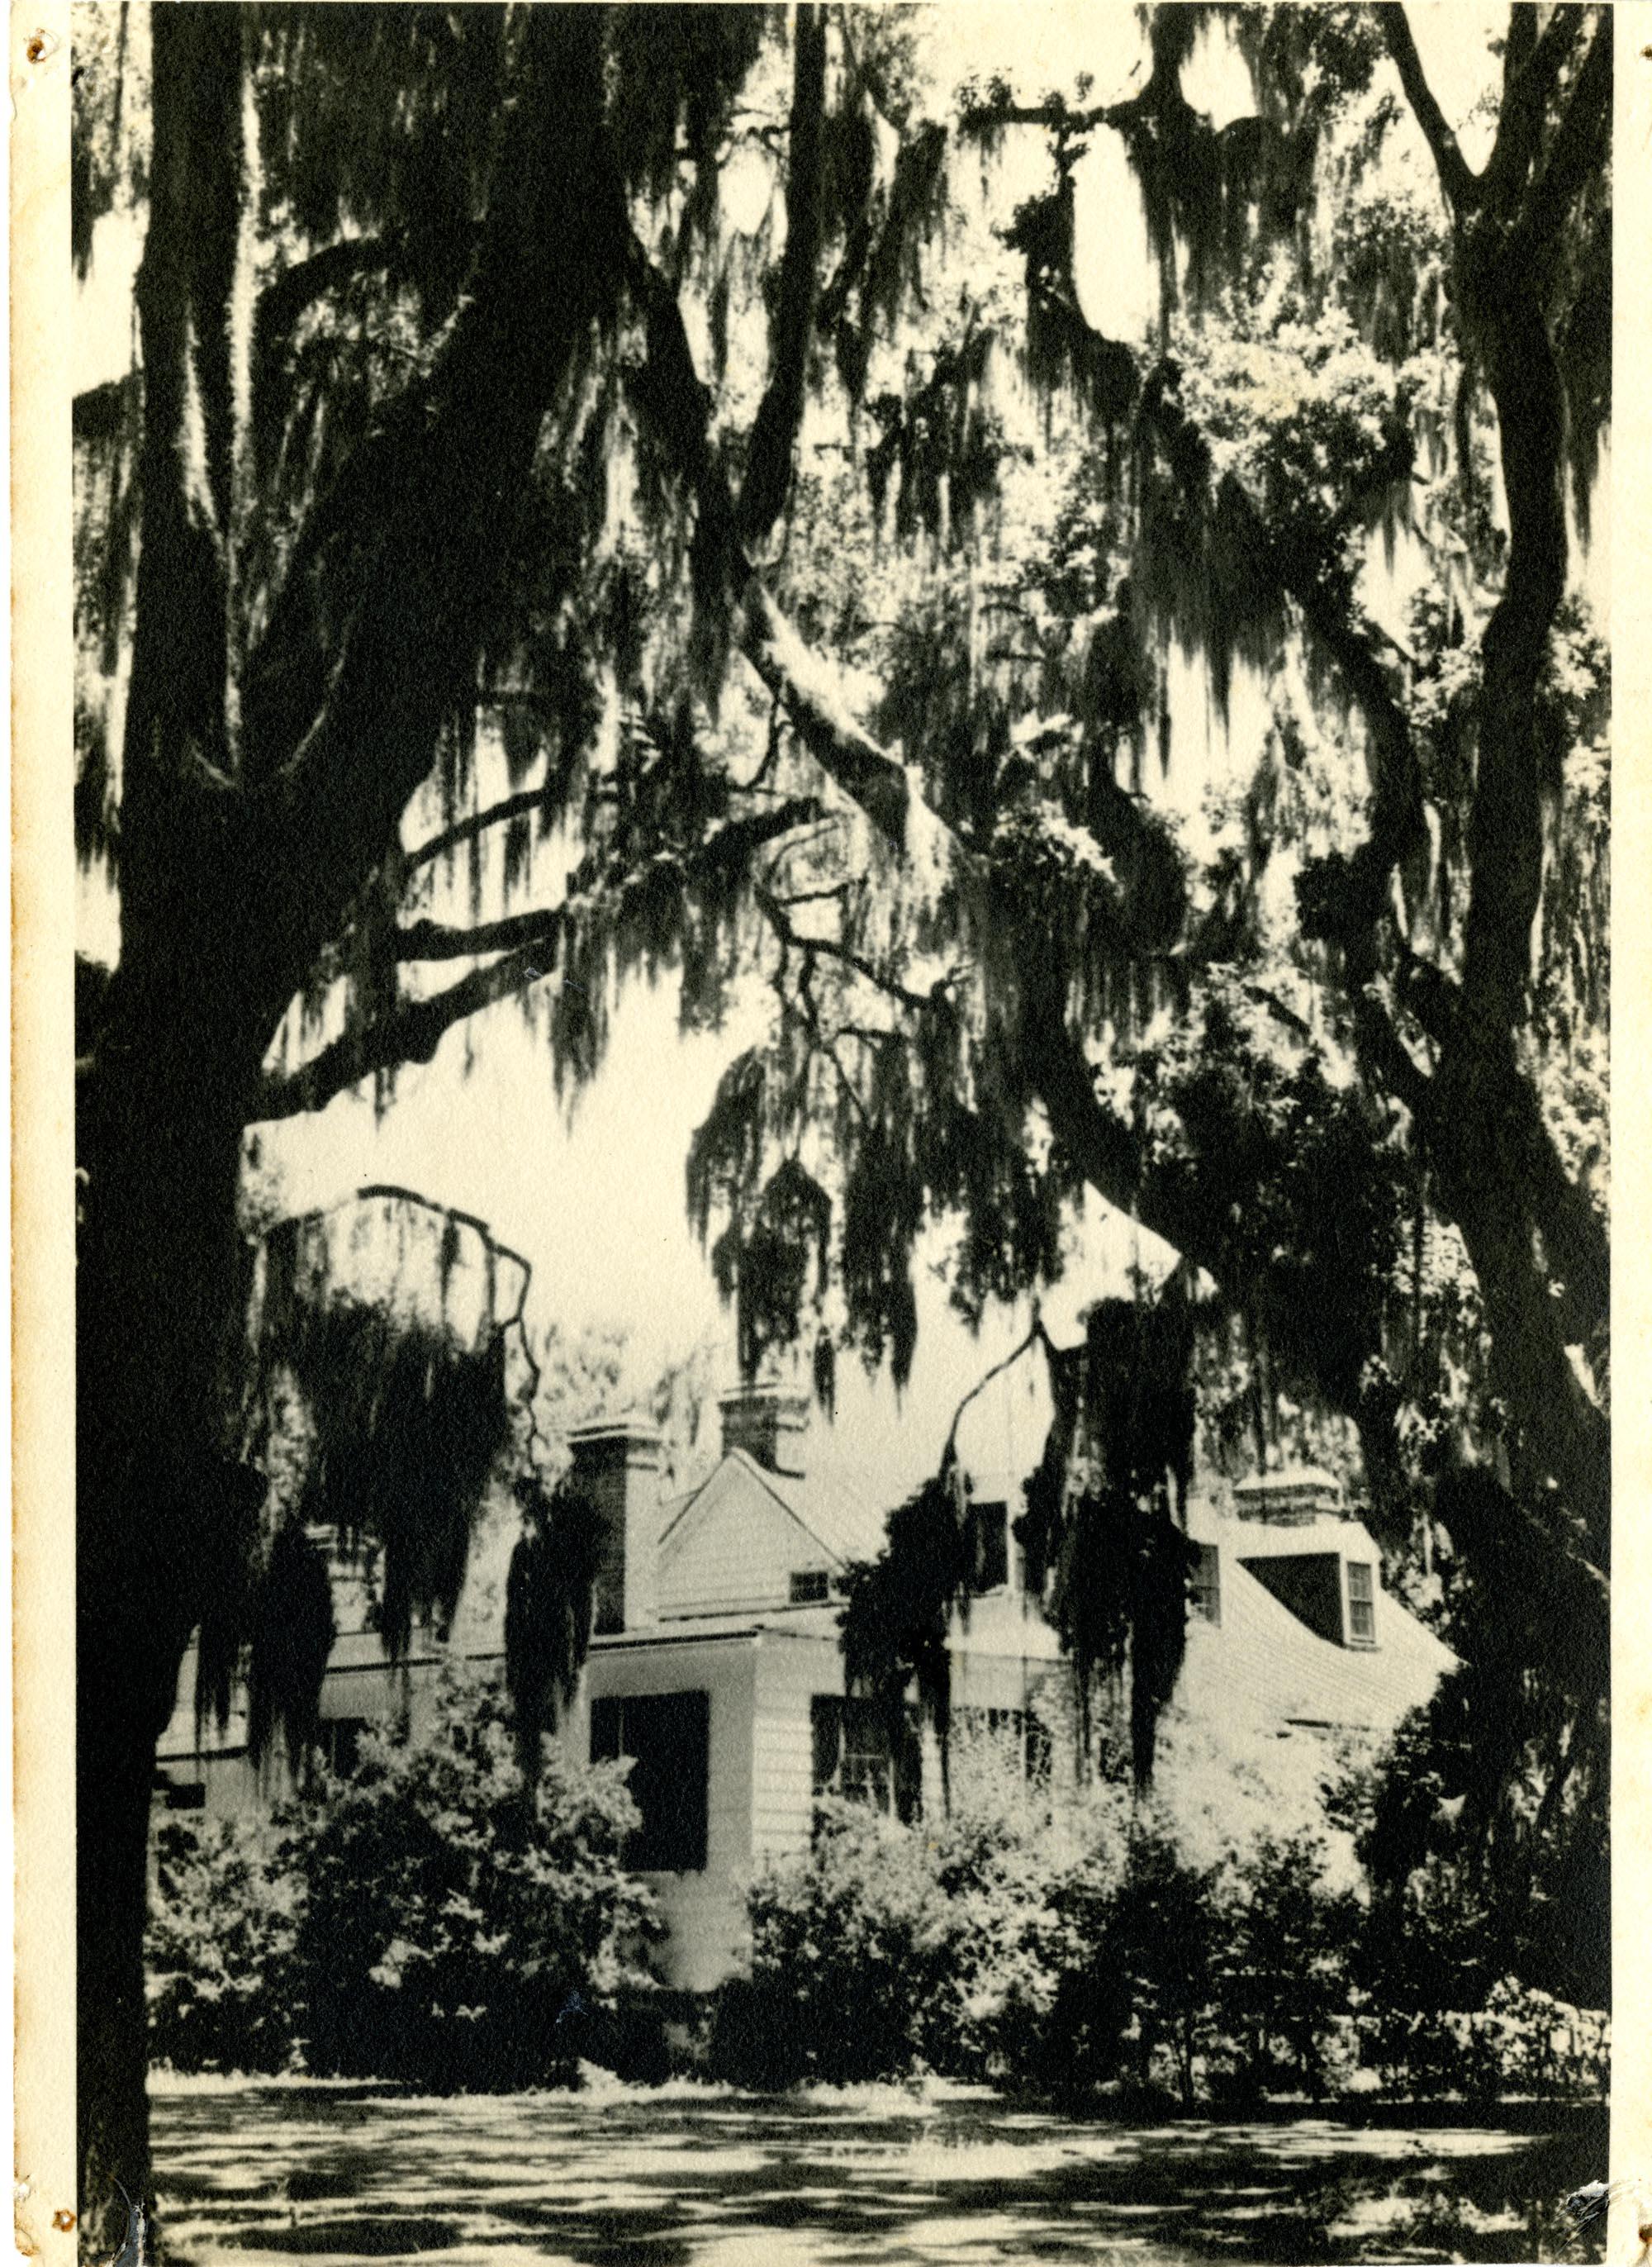 Plantations, The Bluff